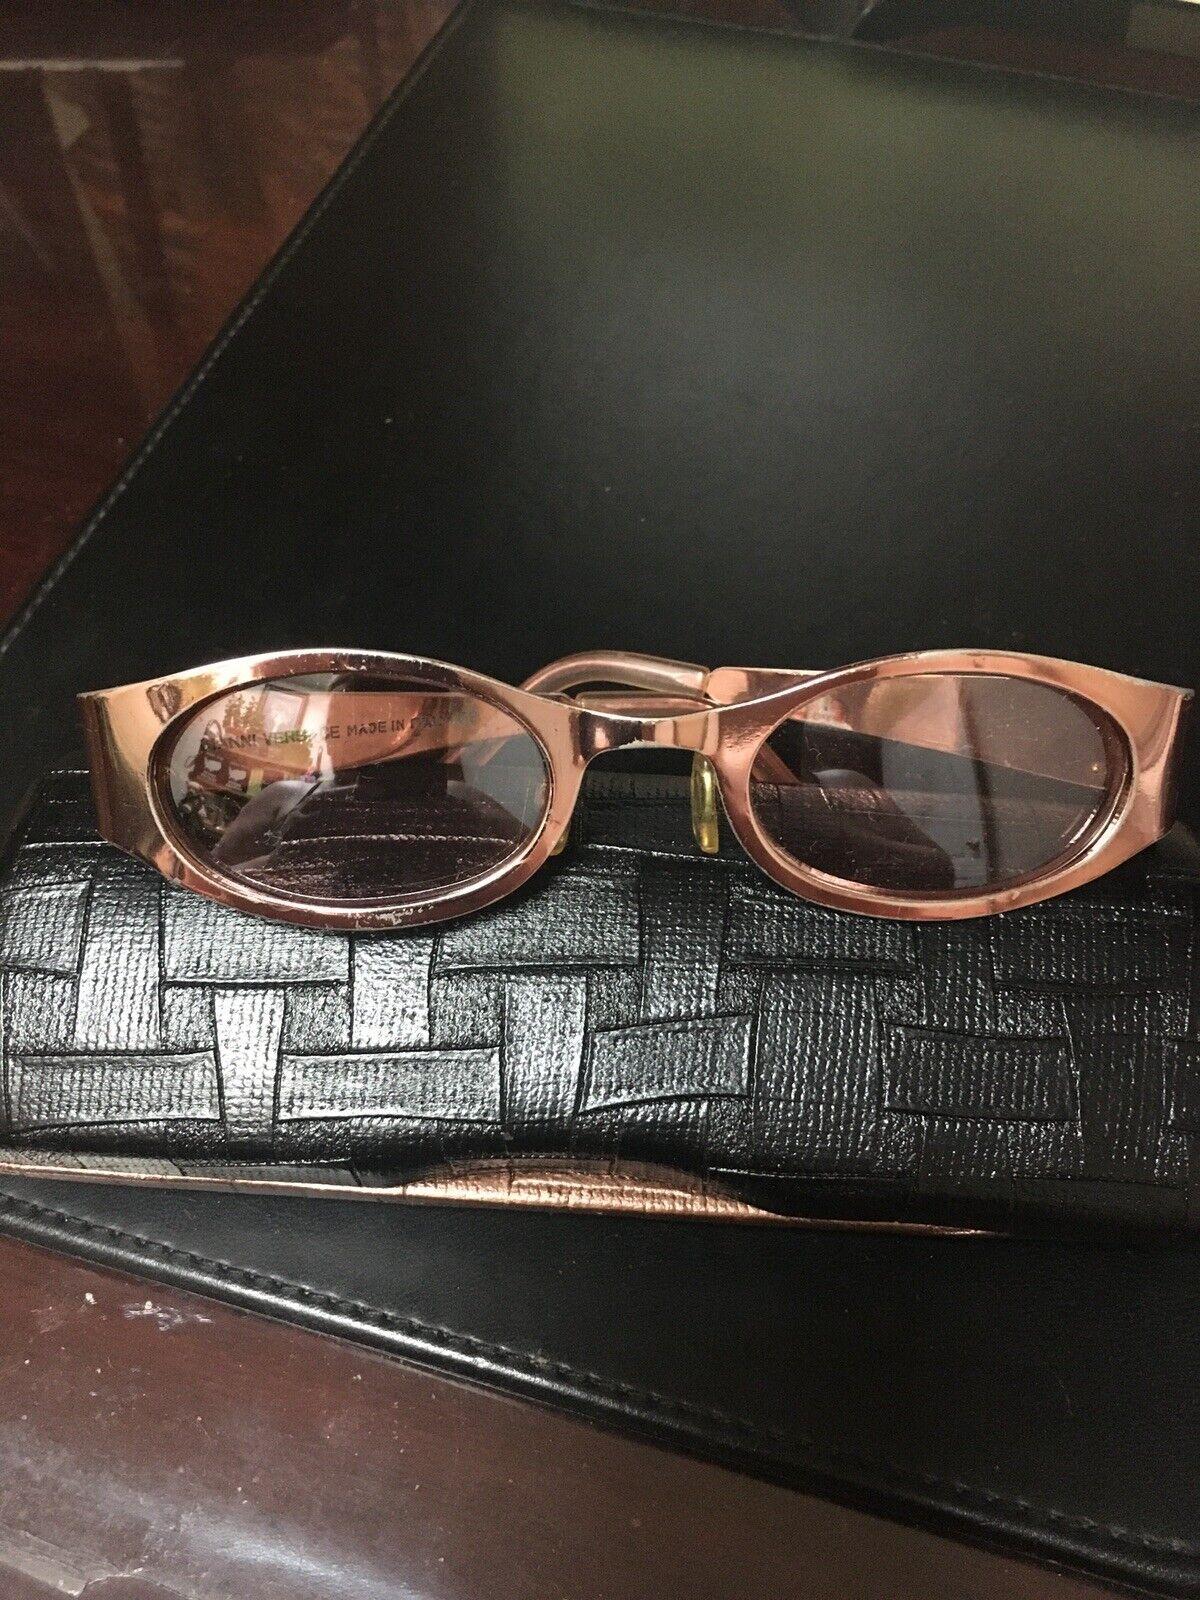 Gianni Versace VINTAGE Italy Sunglasses VERY GOOD… - image 1